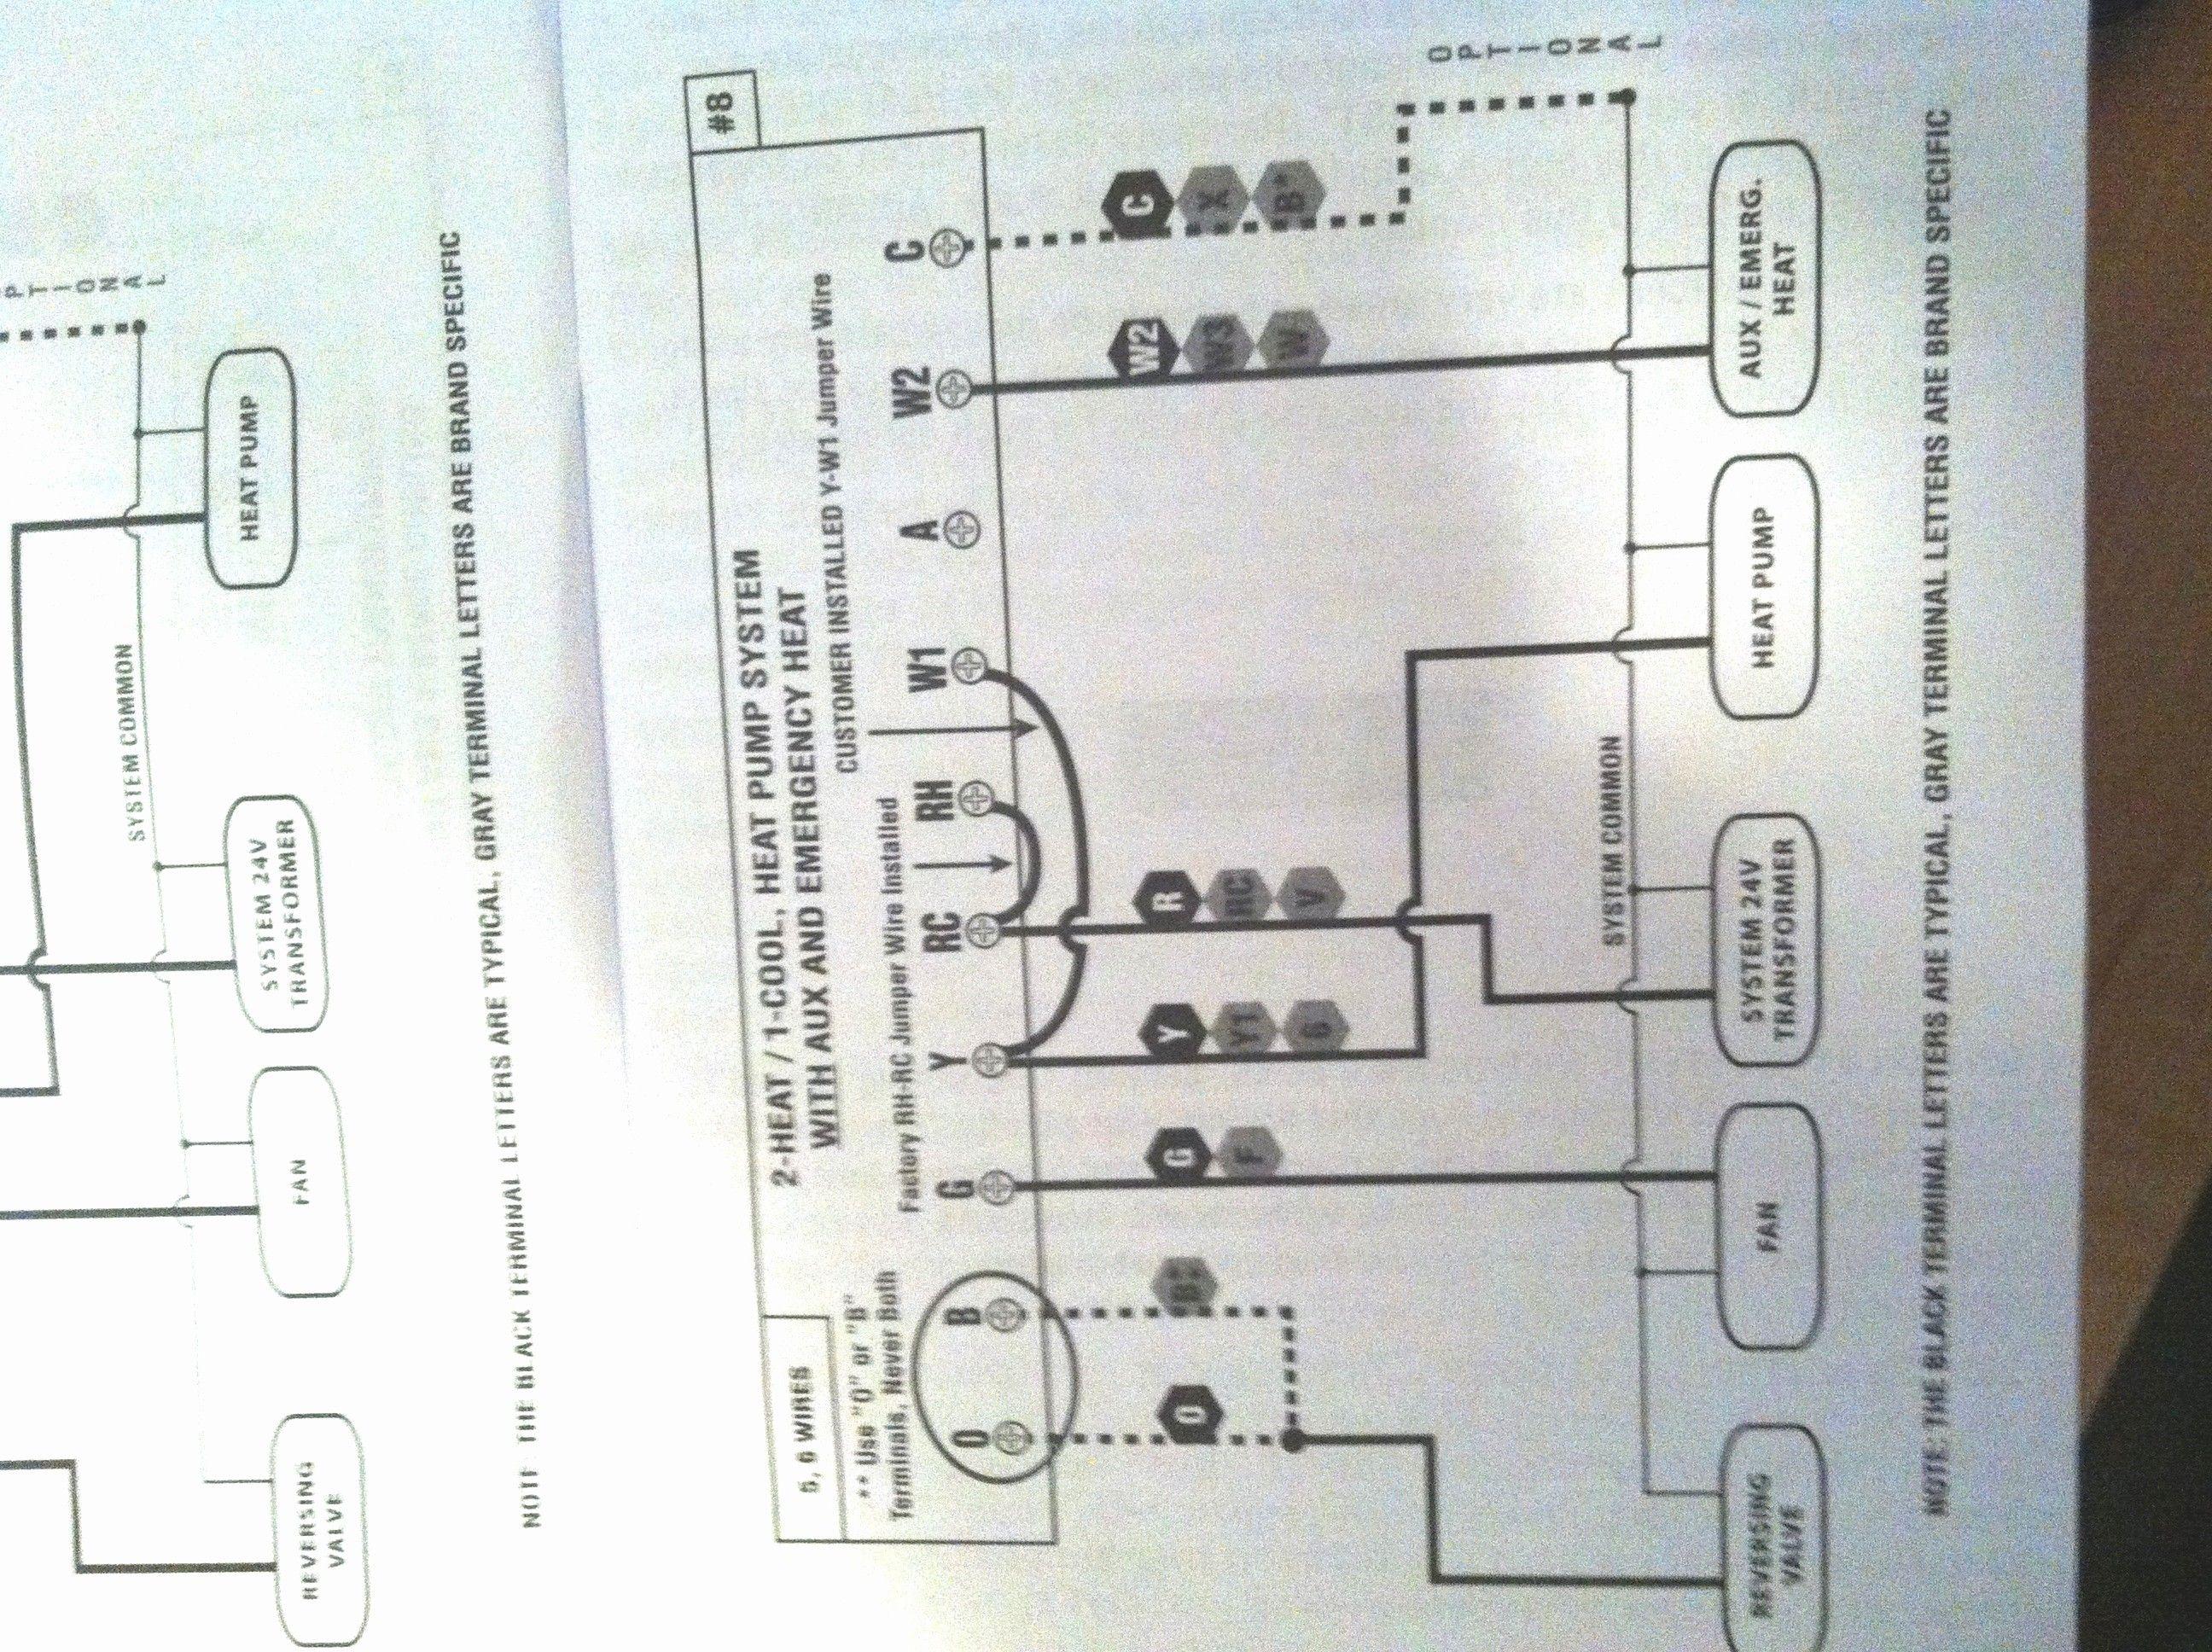 elegant lux 500 thermostat wiring diagram in 2020